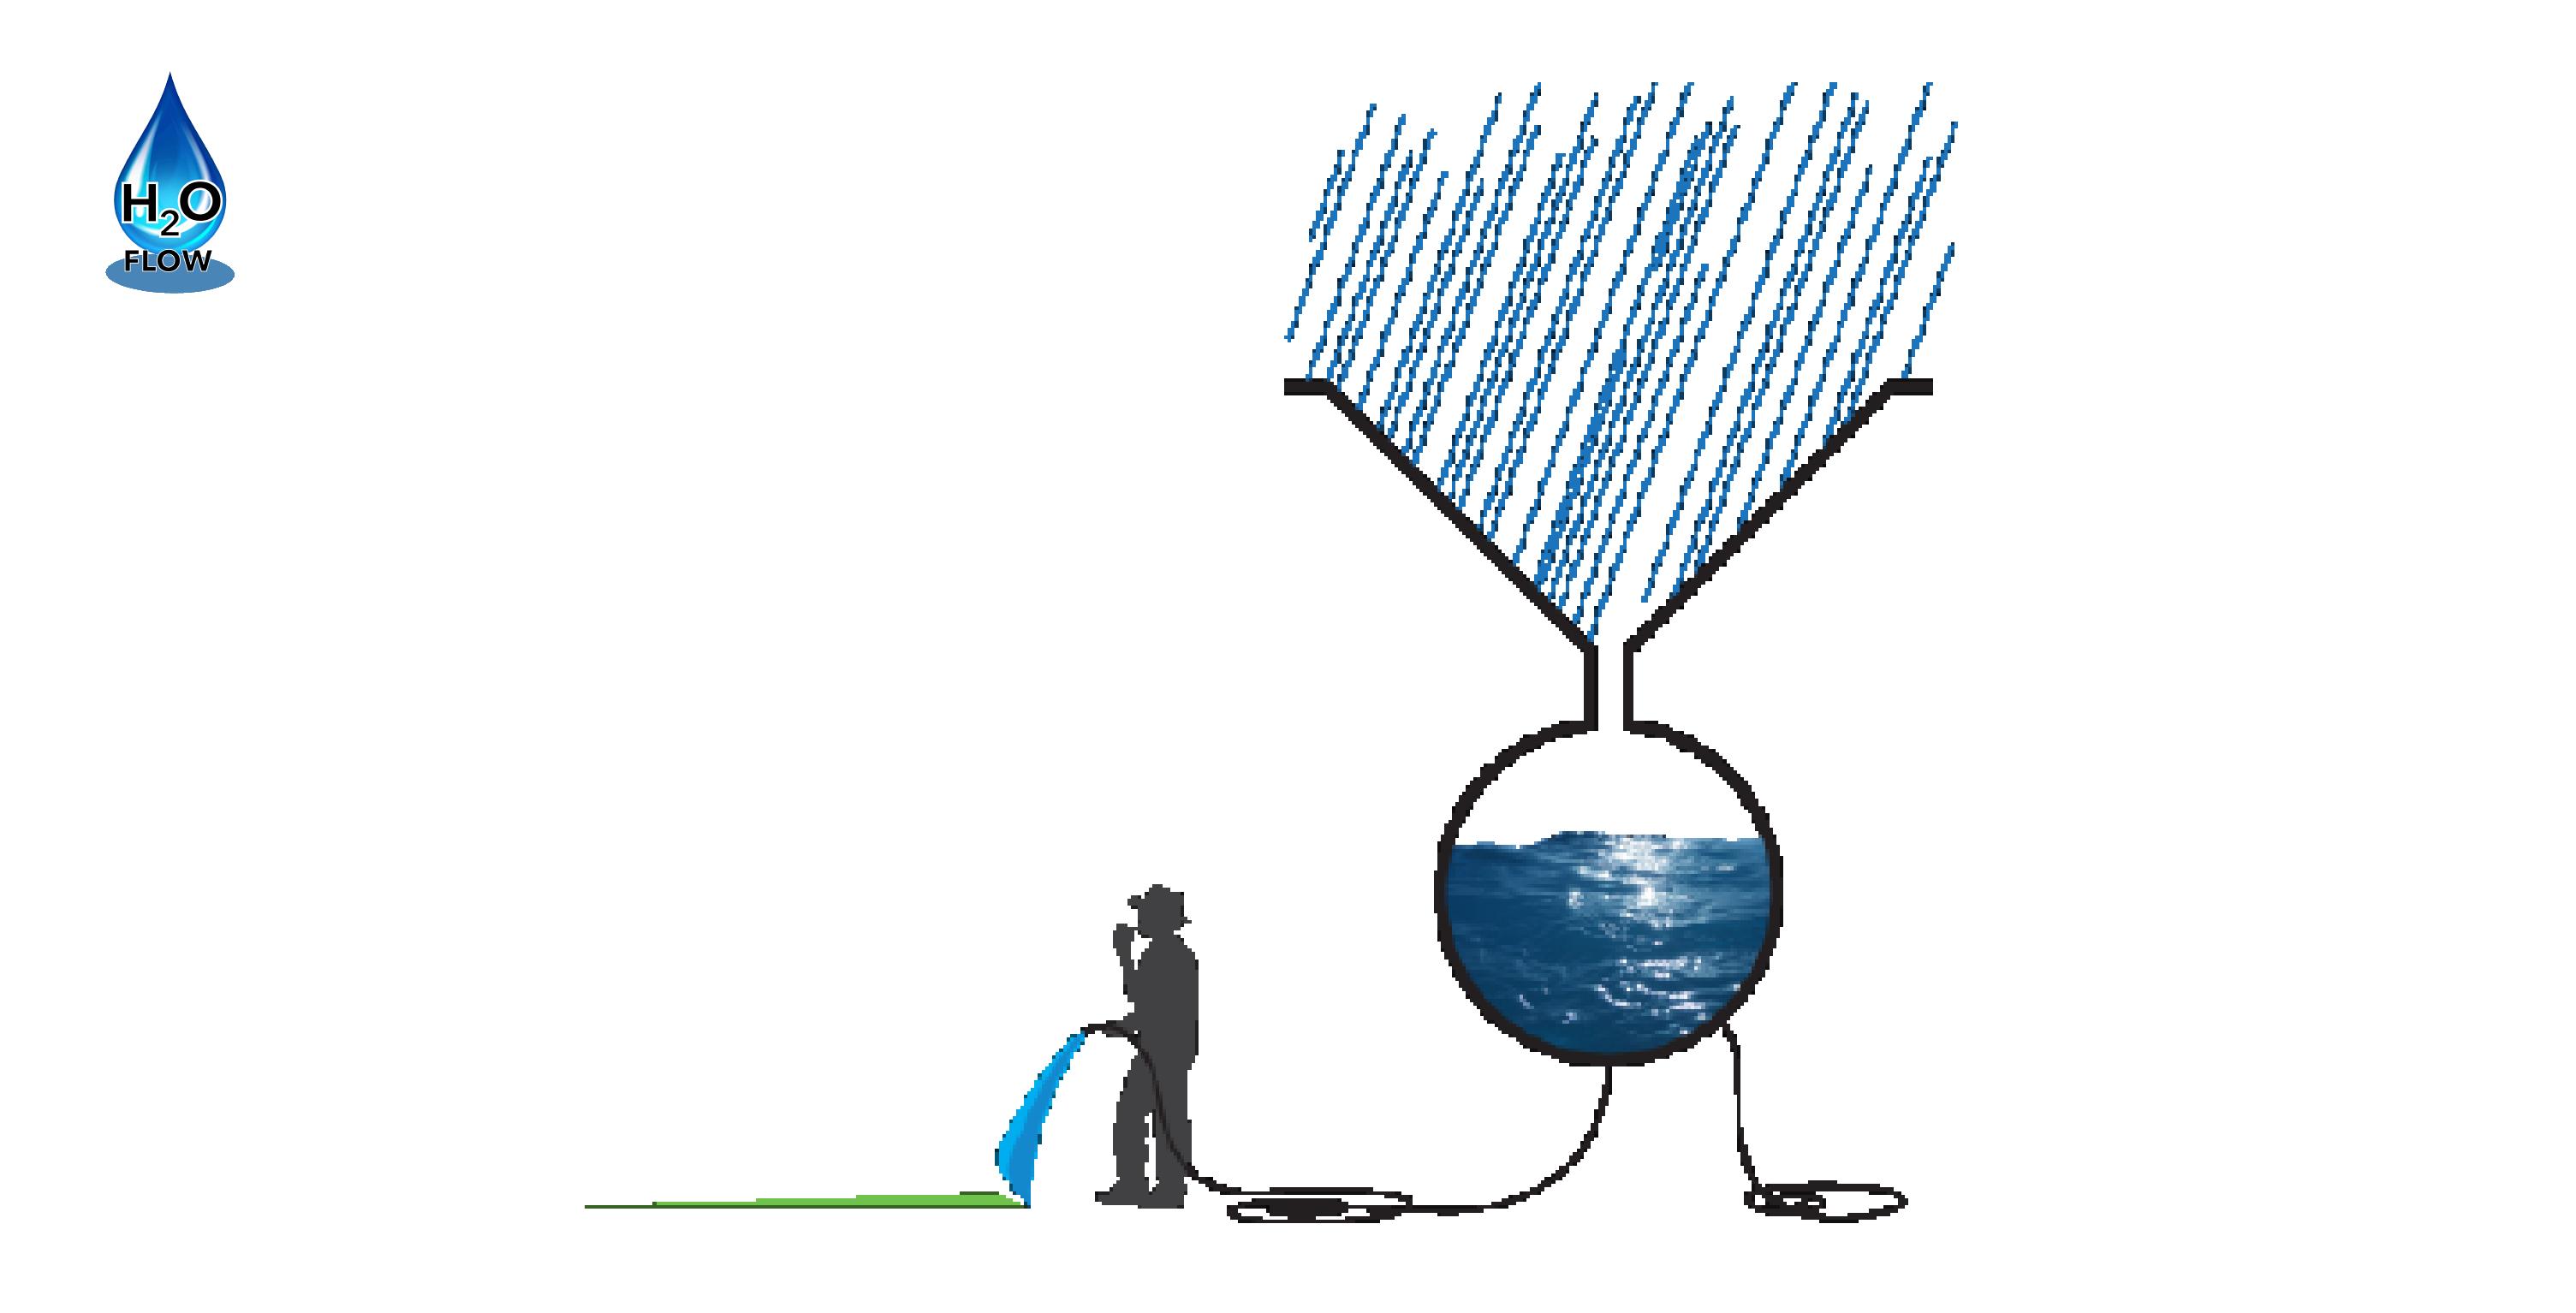 Rainwater Harvesting - H2O FloW